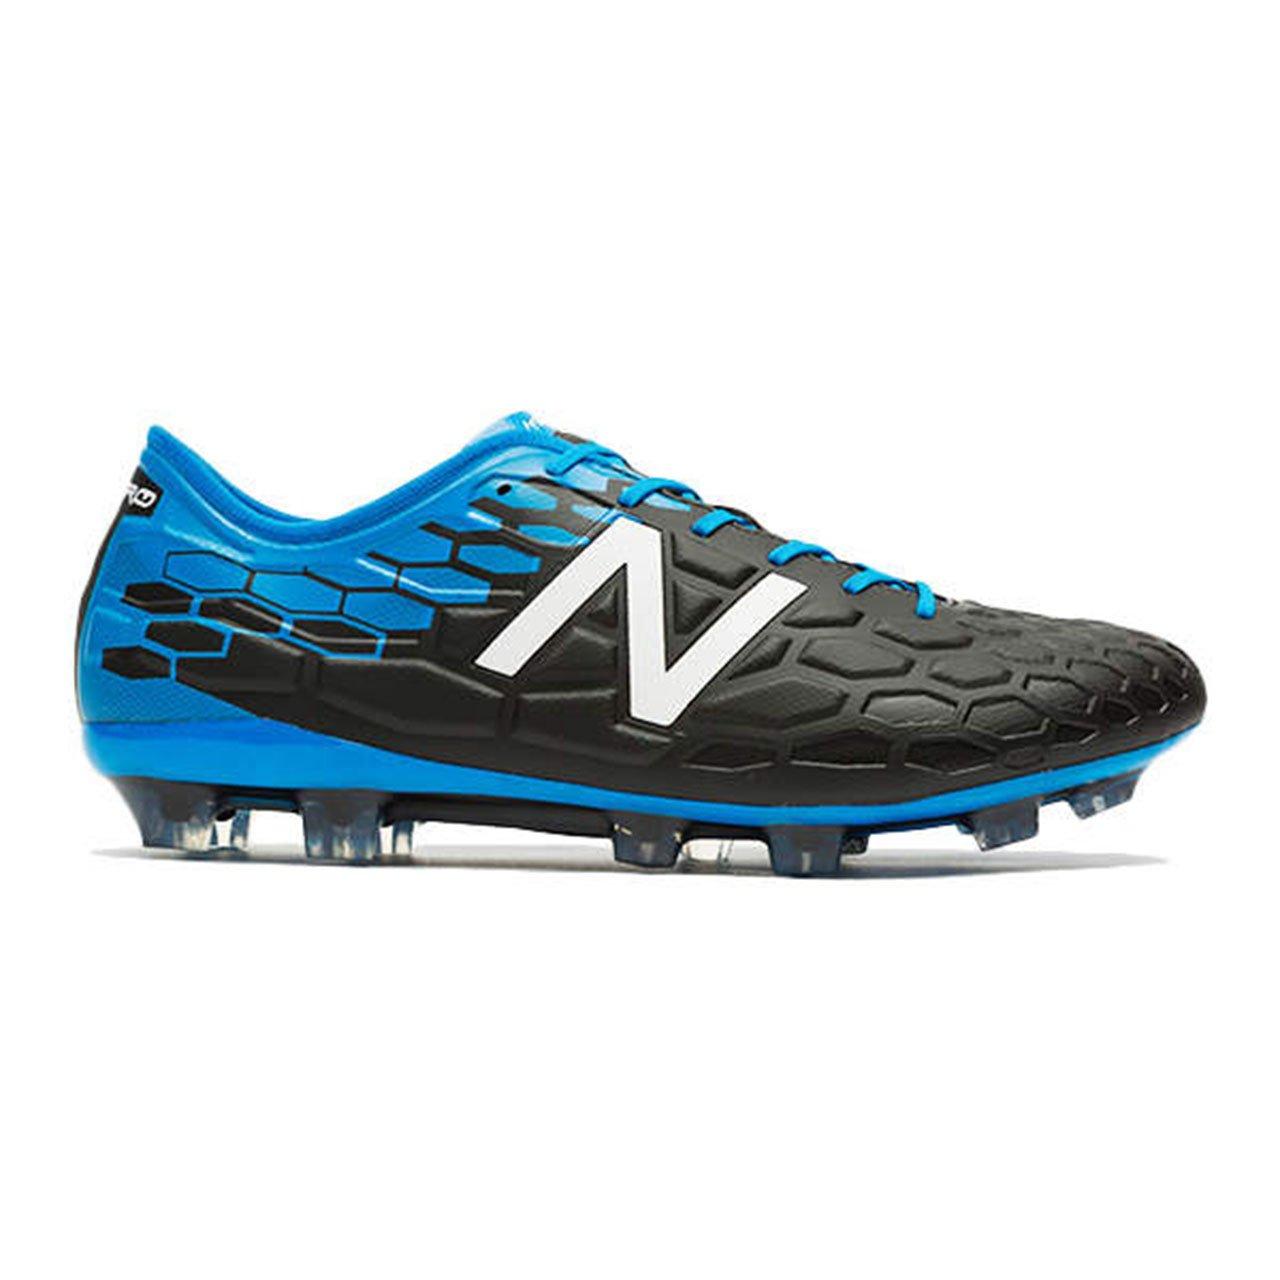 17FW NewBalance ニューバランスシューズ サッカー VISARO PRO HG (メンズ/ユニセックス) MSVROHBL2E B074DD2LZC 25.5 BL:BLACK/BLUE